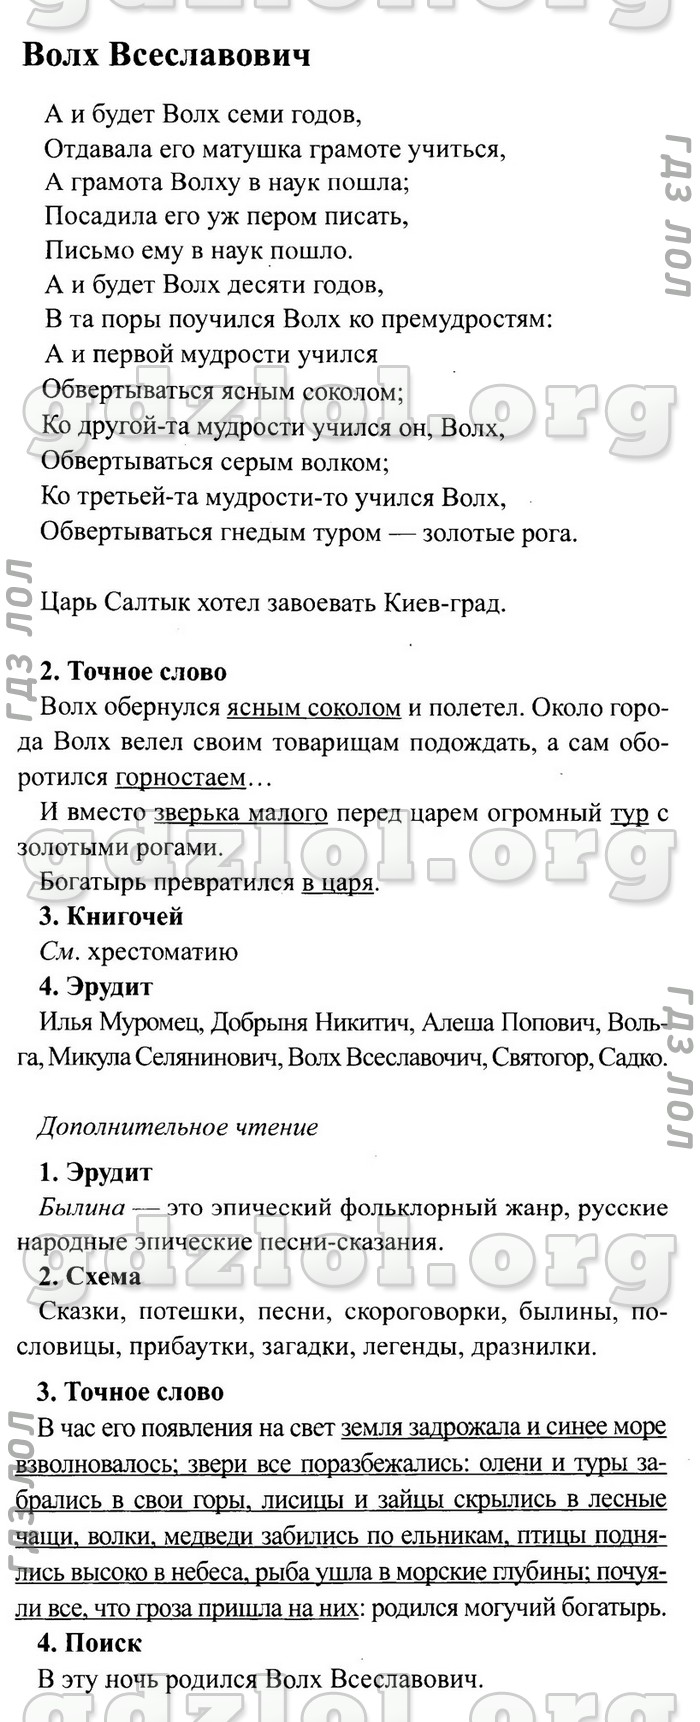 Гдз по литературе 4 класс ефросинина